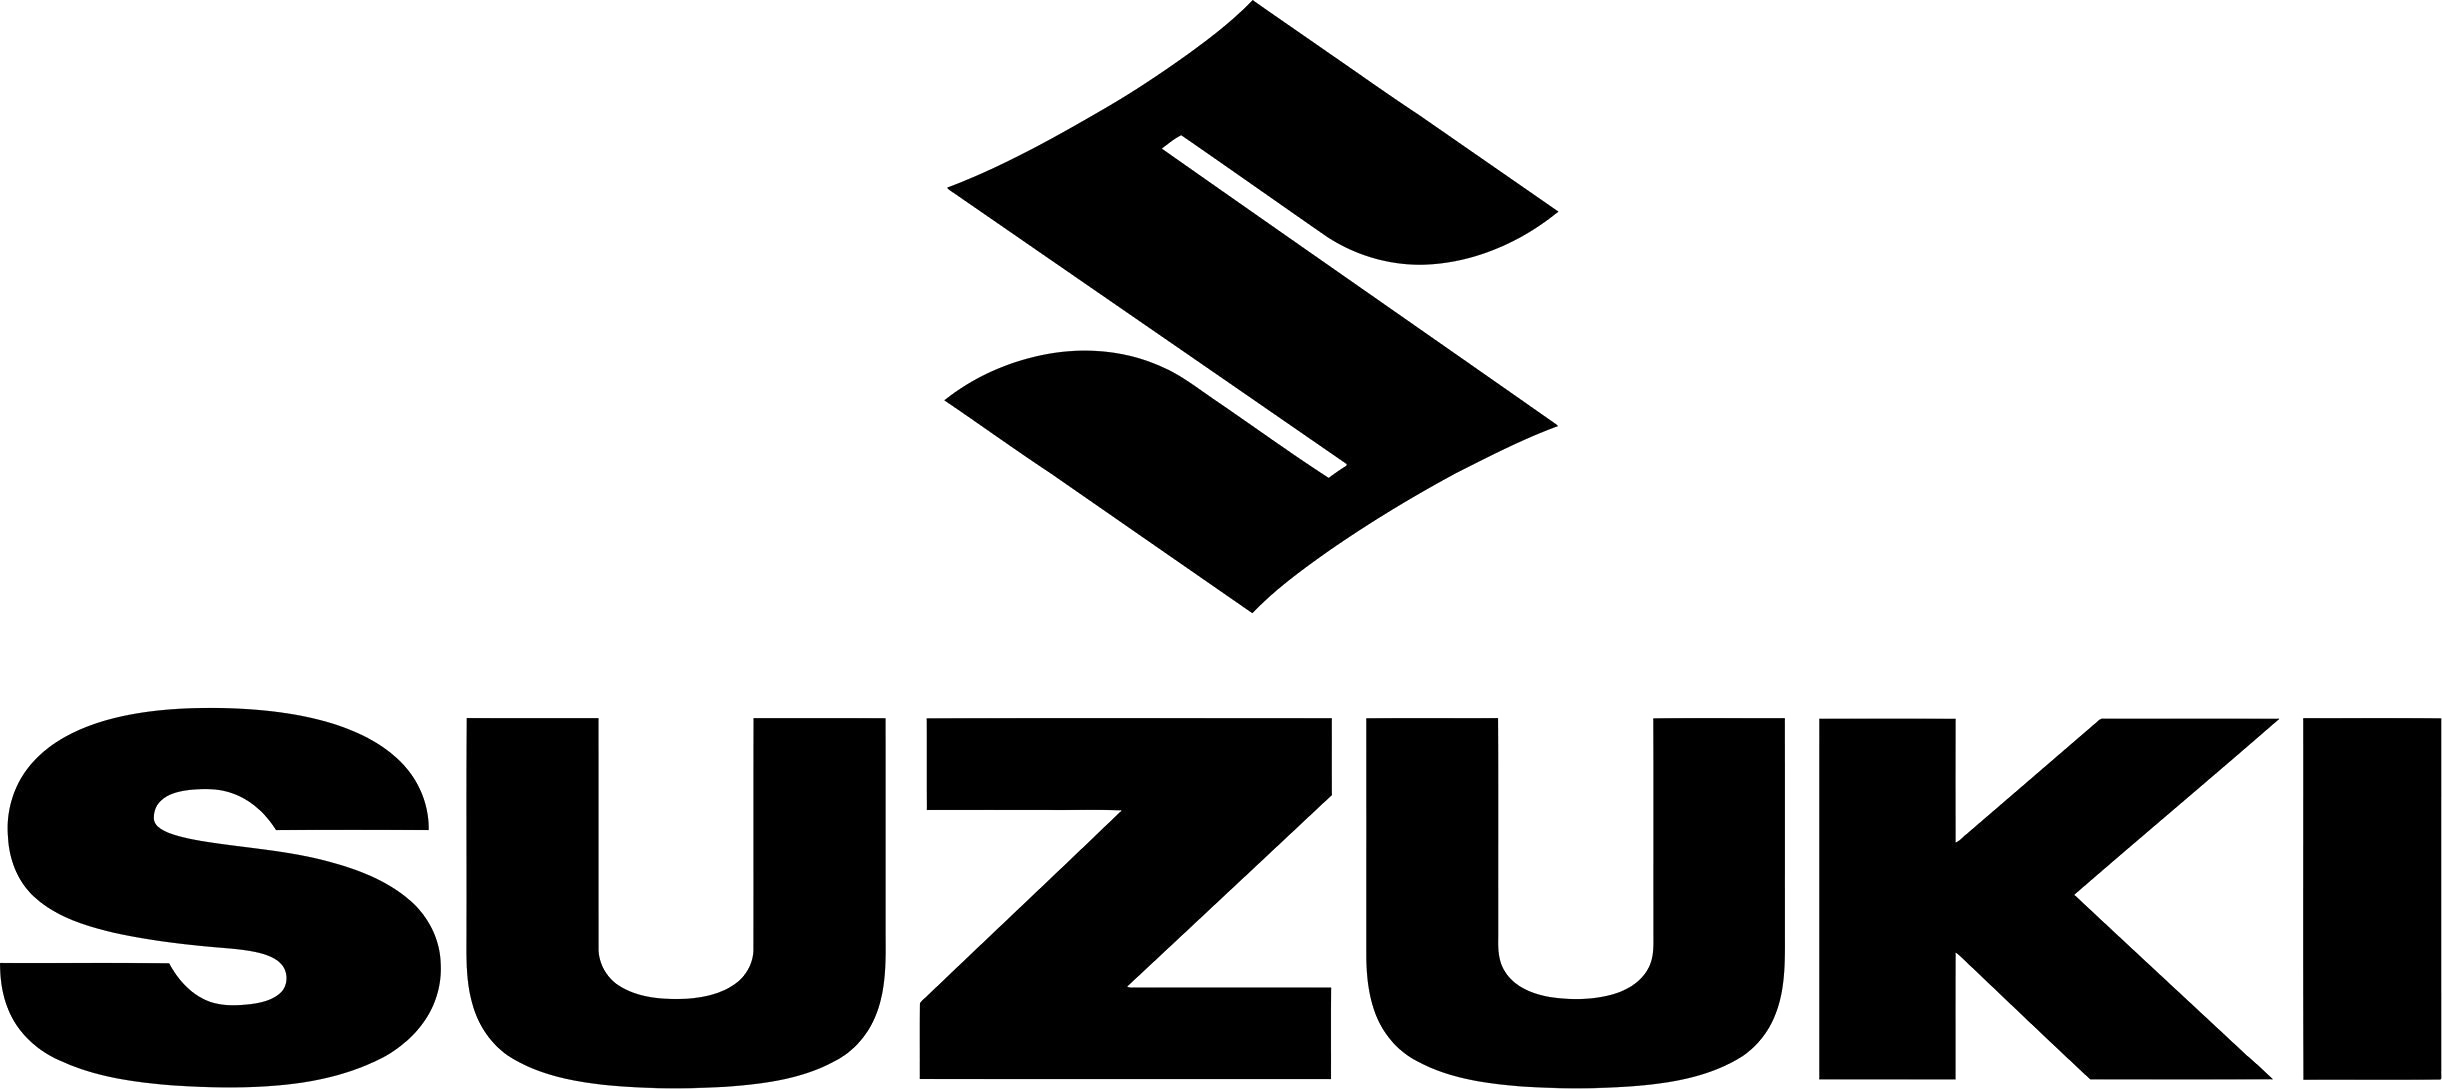 Suzuki PNG Images Transparent Free Download.